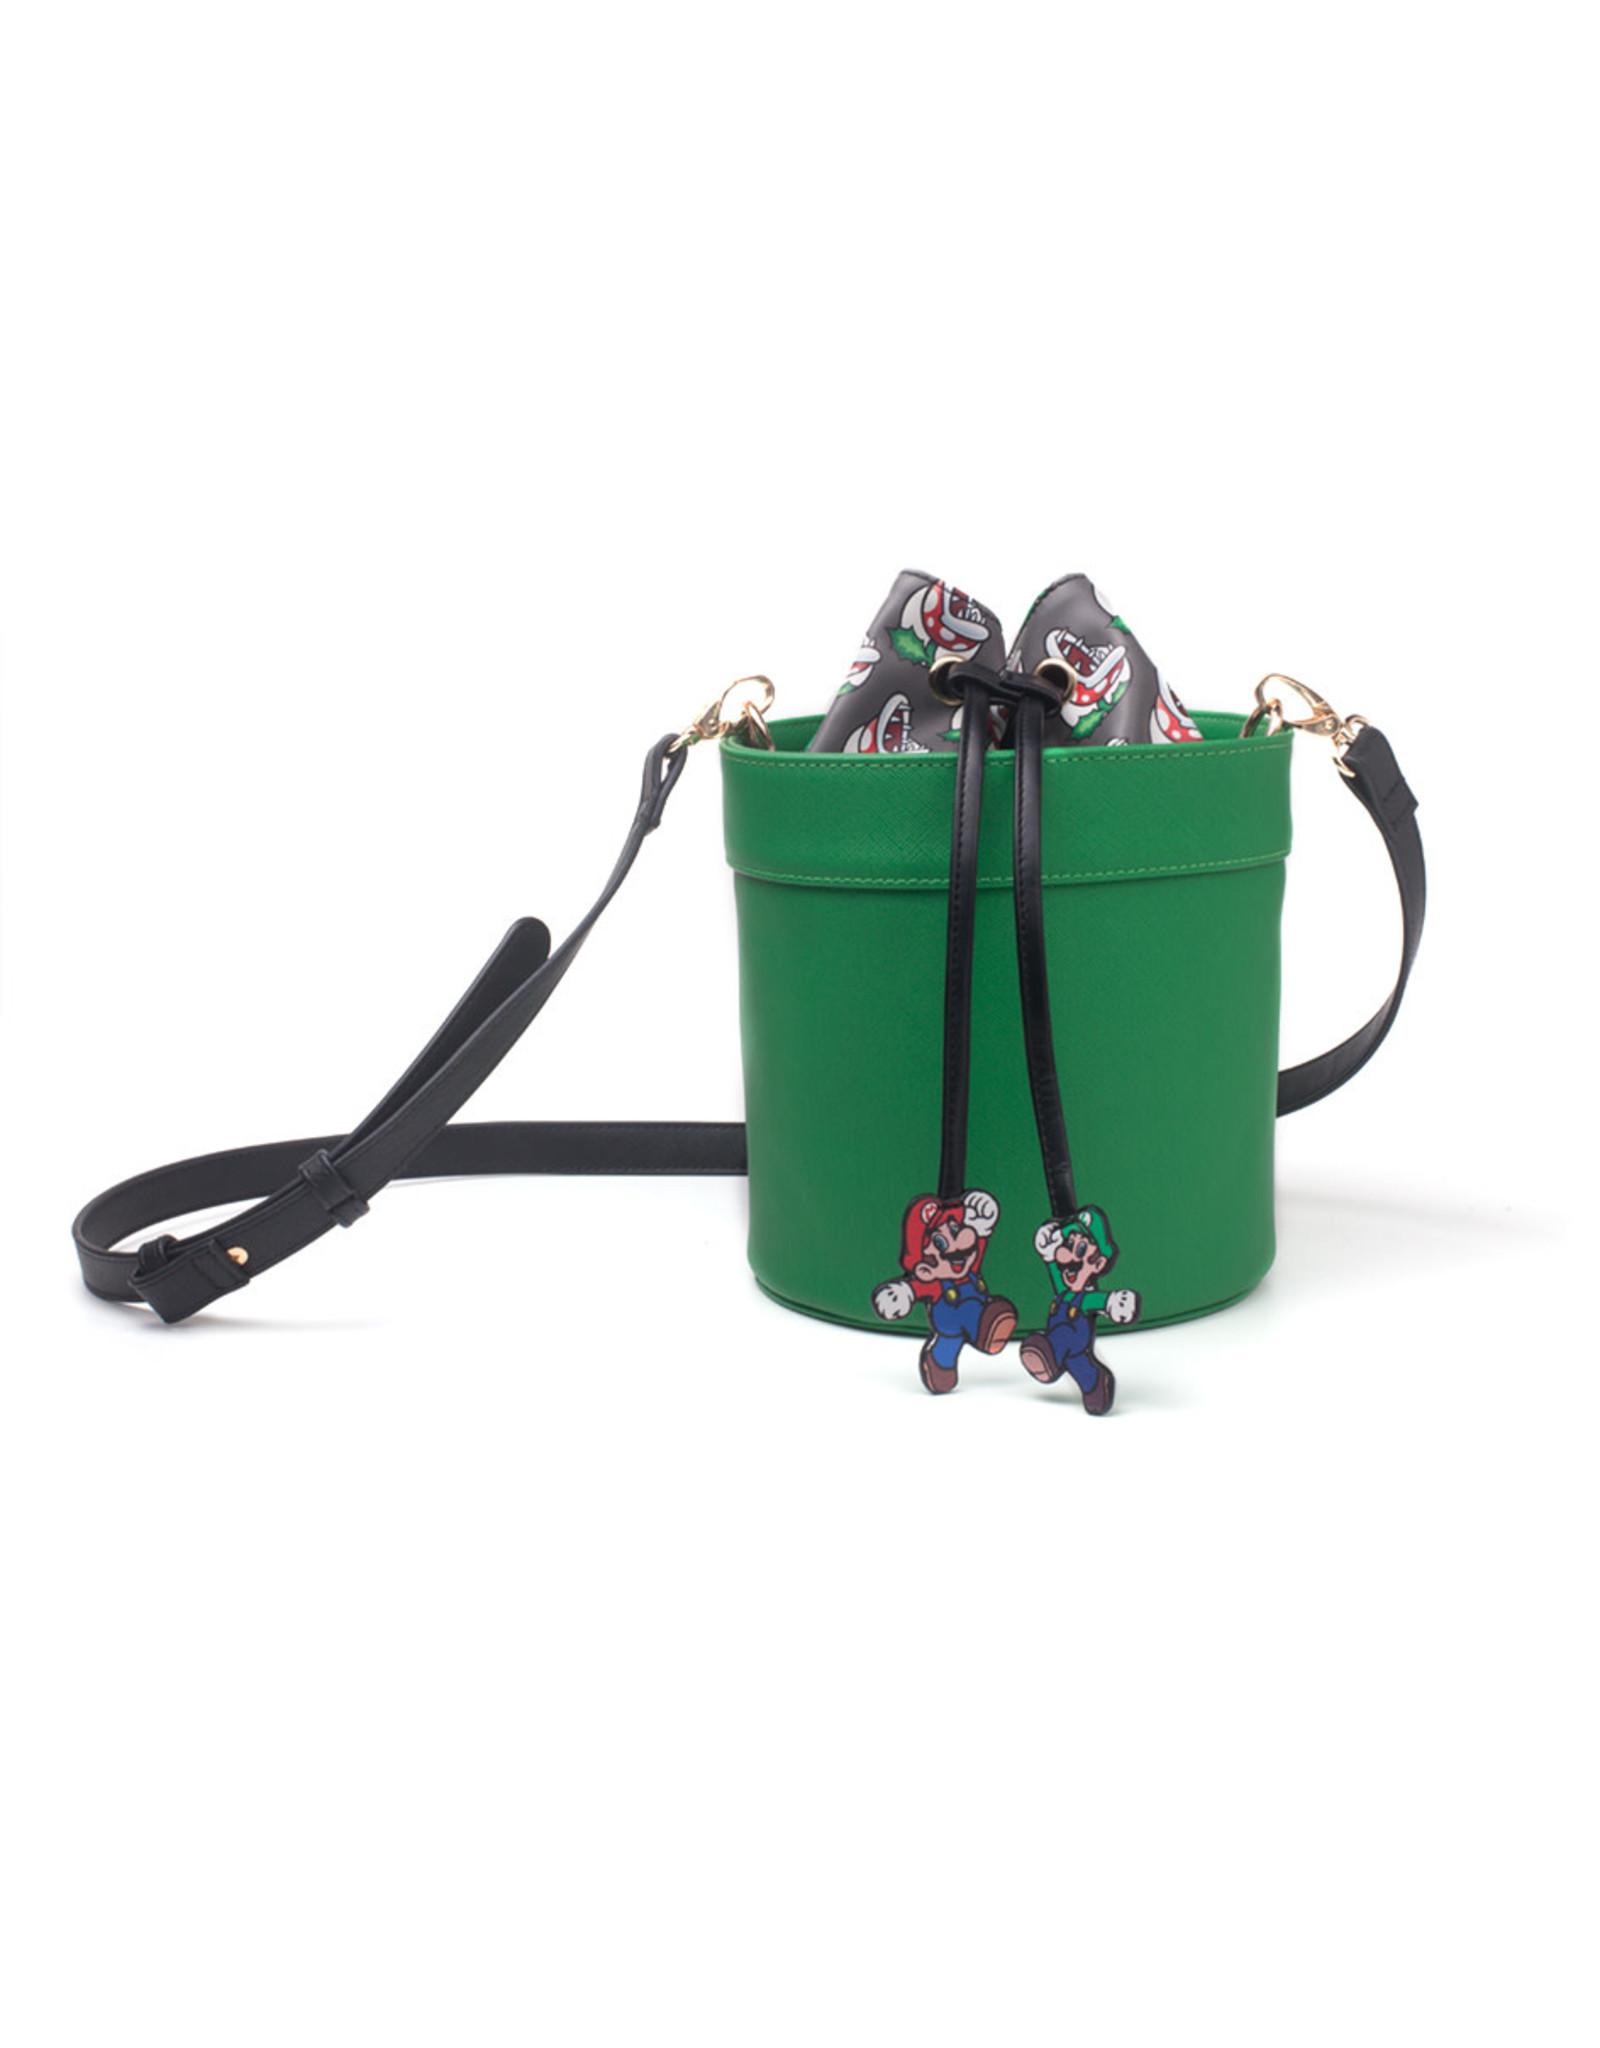 SUPER MARIO - Pipe Shaped - Crossbody bag